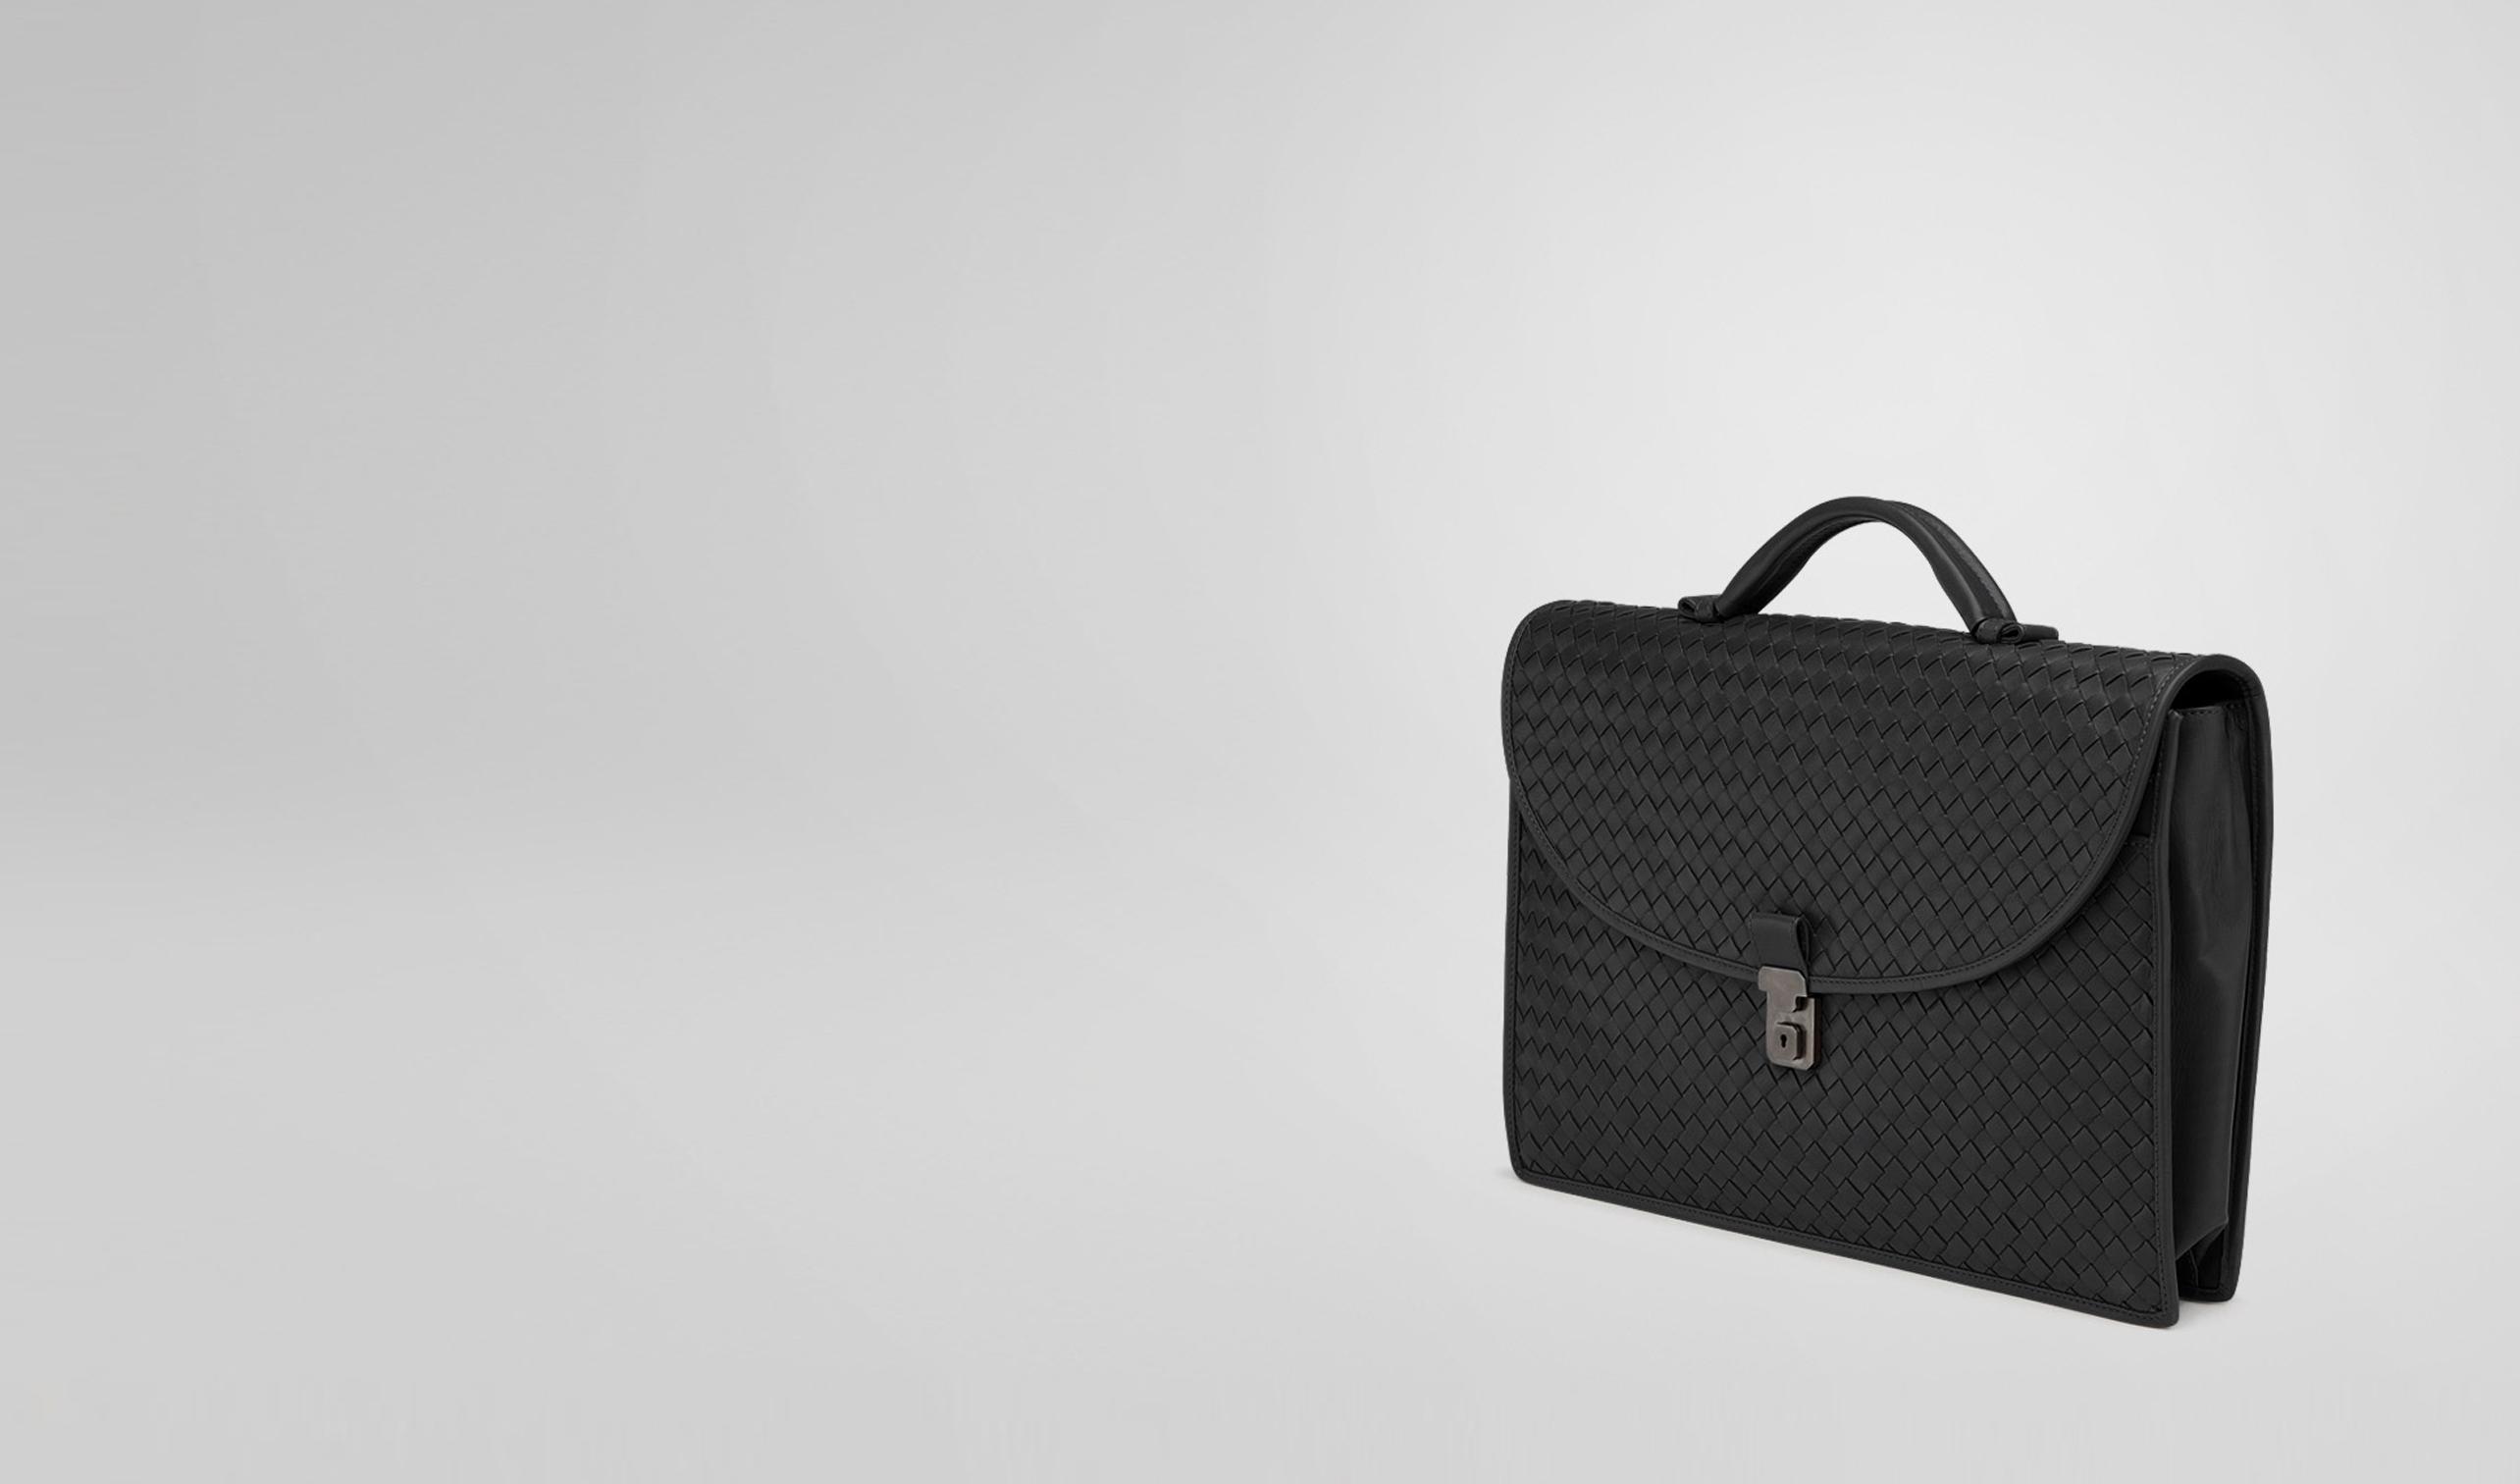 BOTTEGA VENETA Business Tasche U Aktentasche aus leichtem Kalbsleder Intrecciato Nero pl